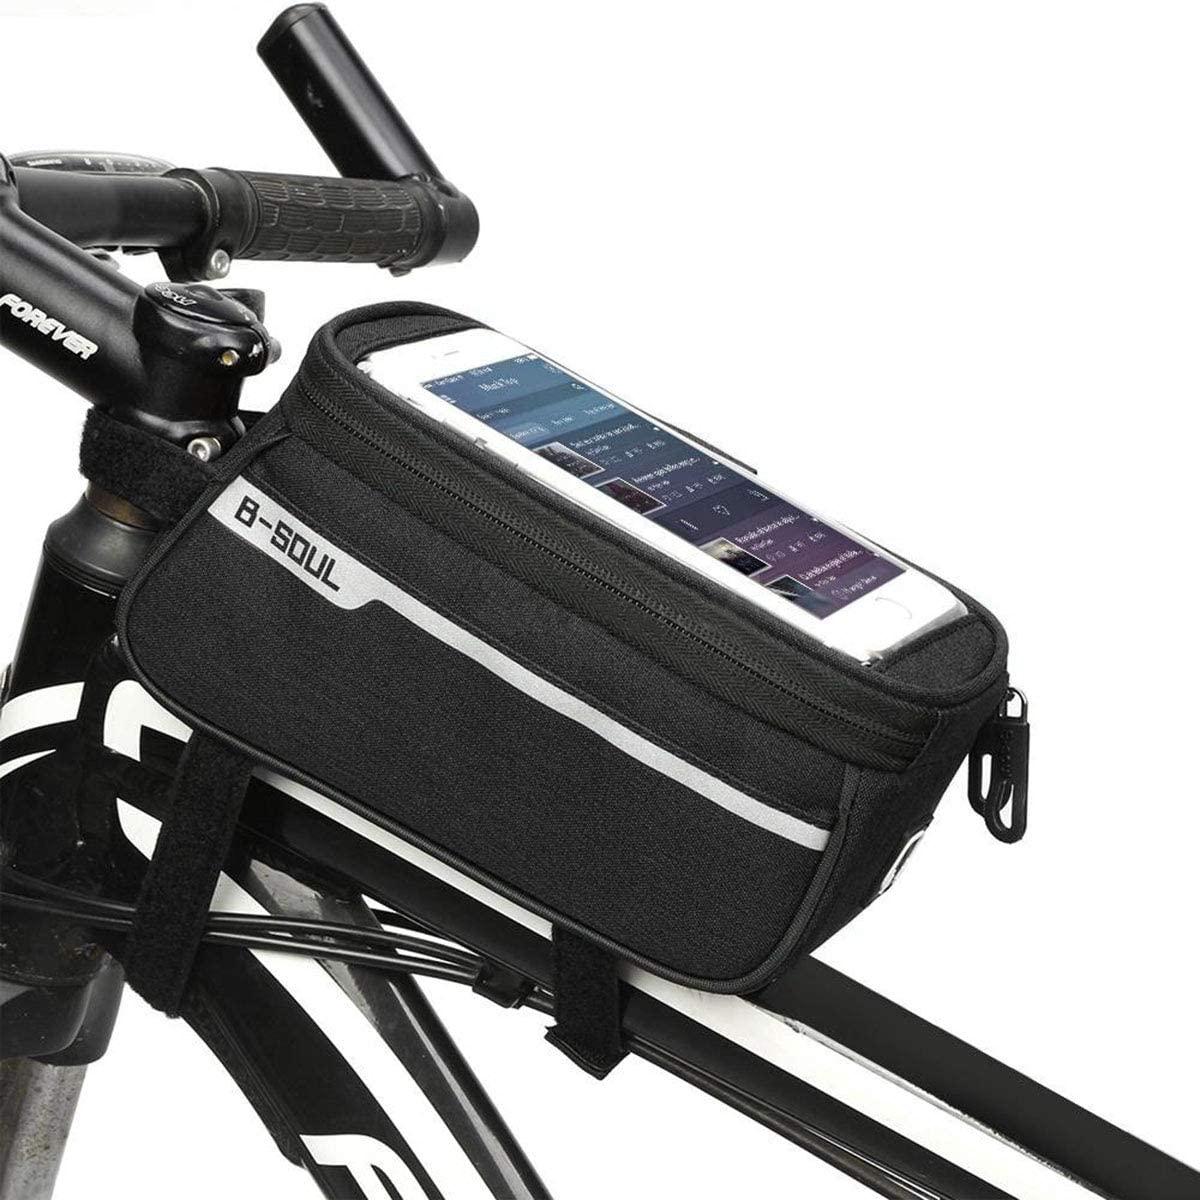 Ruiqas Bicycle Storage Bag, Bicycle Cycling Front Frame Tube Handlebar Bag Pouch Bicycle Mobile Phone Holder Storage Bag